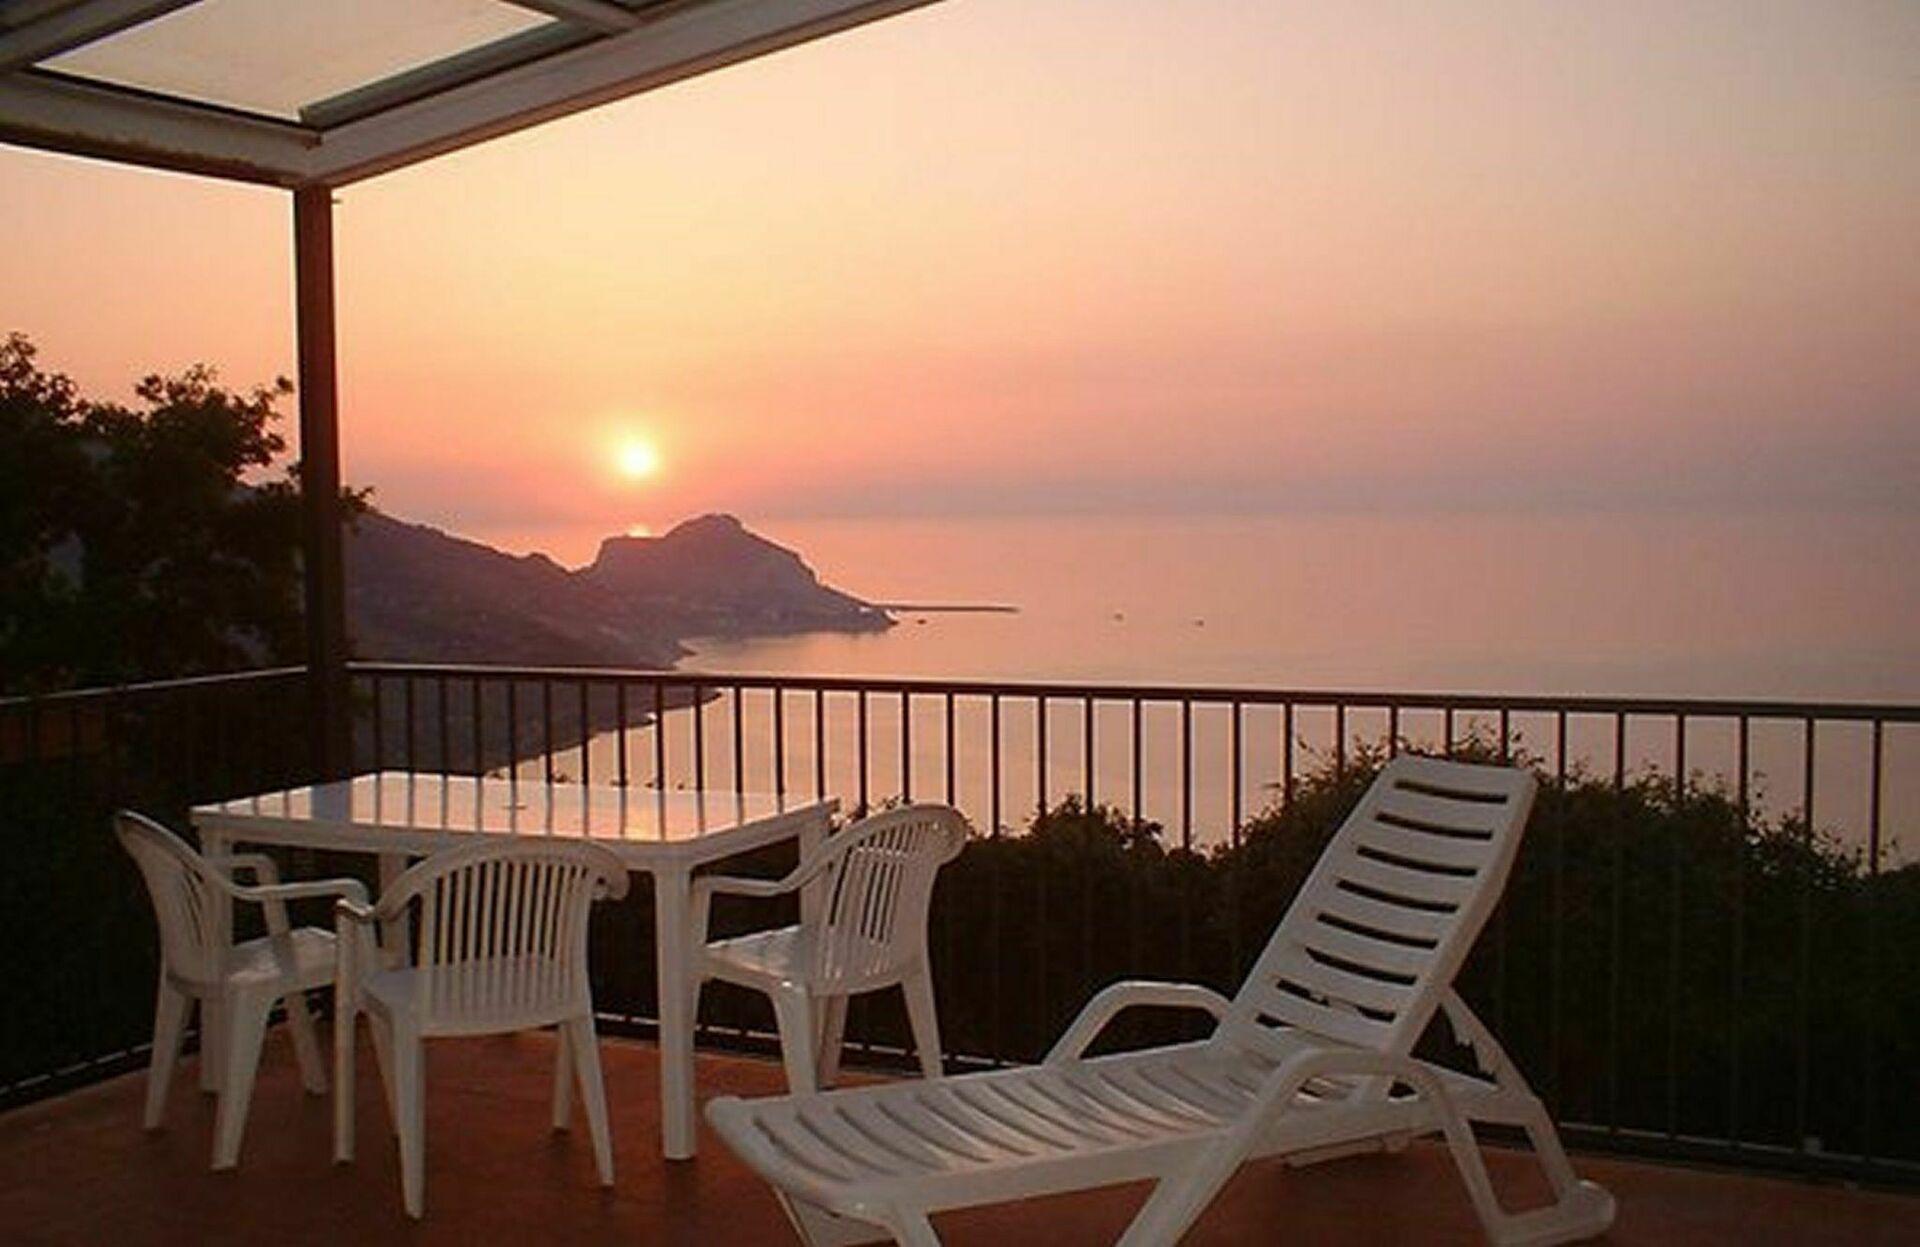 yout holiday vacation rentals - HD1920×1247